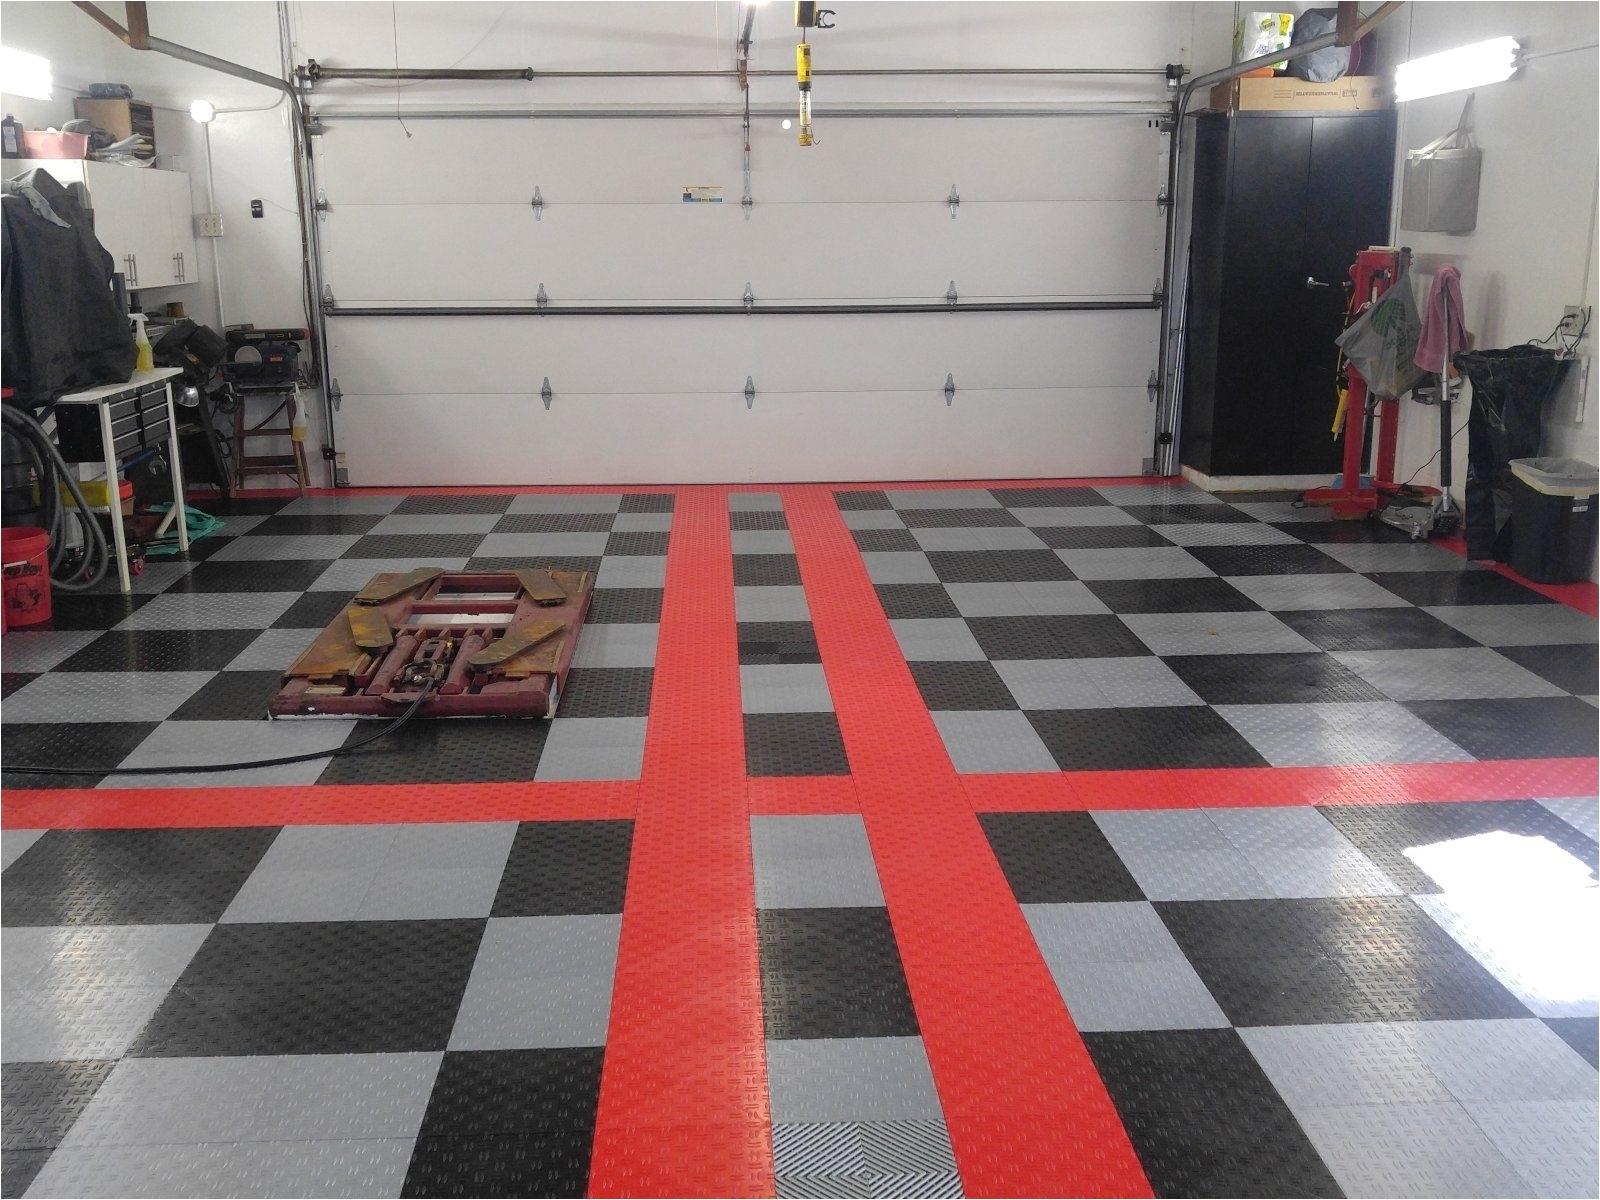 Cheapest Garage Floor Ideas Best Floor Coatings Cheap Interlocking - Best rated garage floor tiles